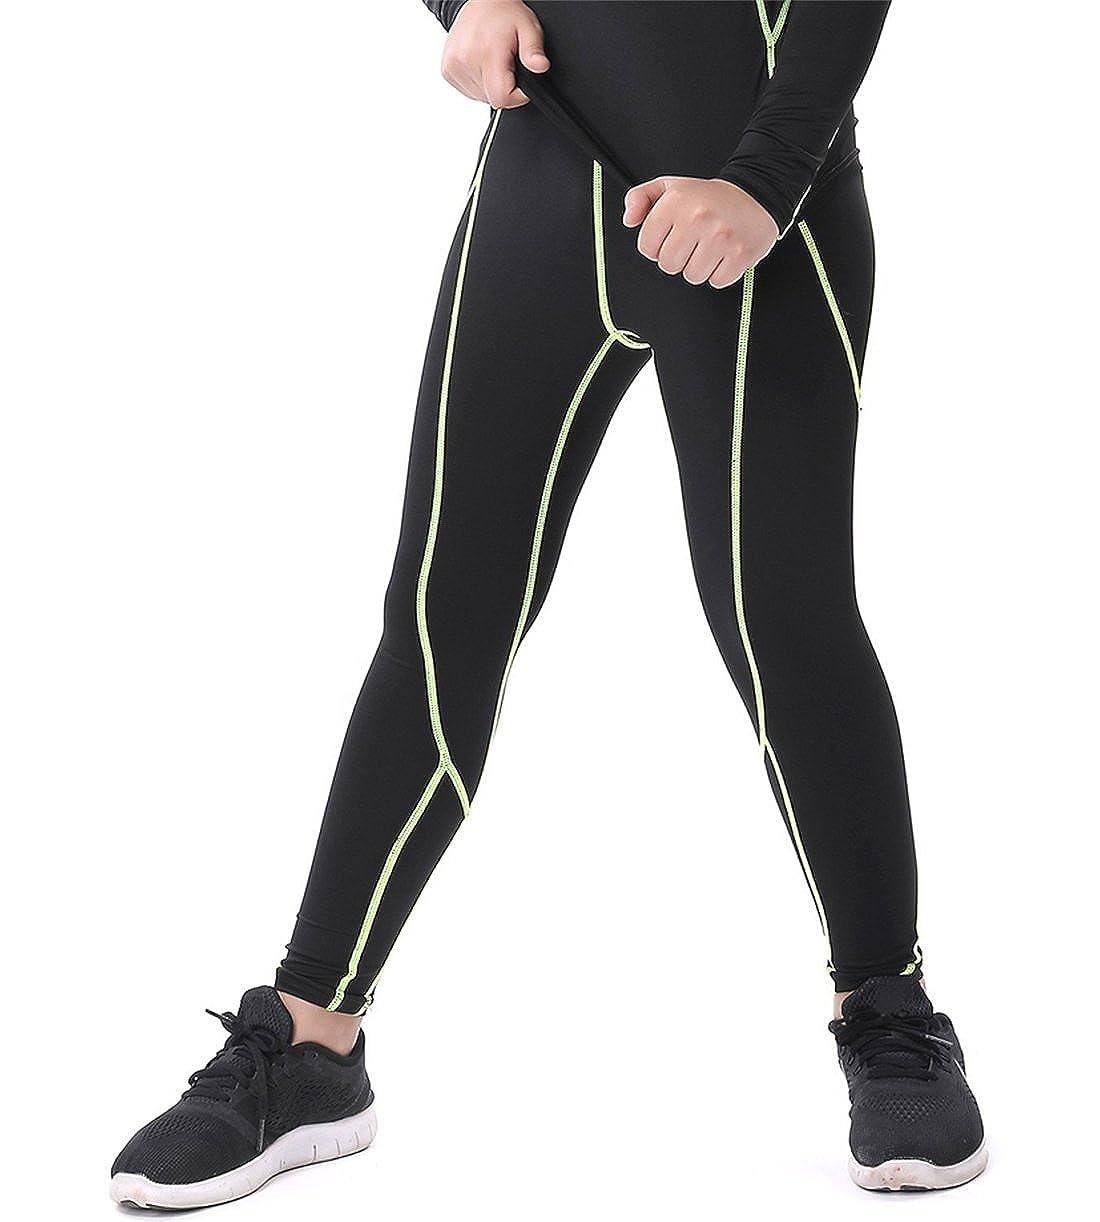 QCHENG Boys & Girls Compression Tights Sport Leggings Base Layer Soccer Hockey Thermal Pants for Kids QEYS007